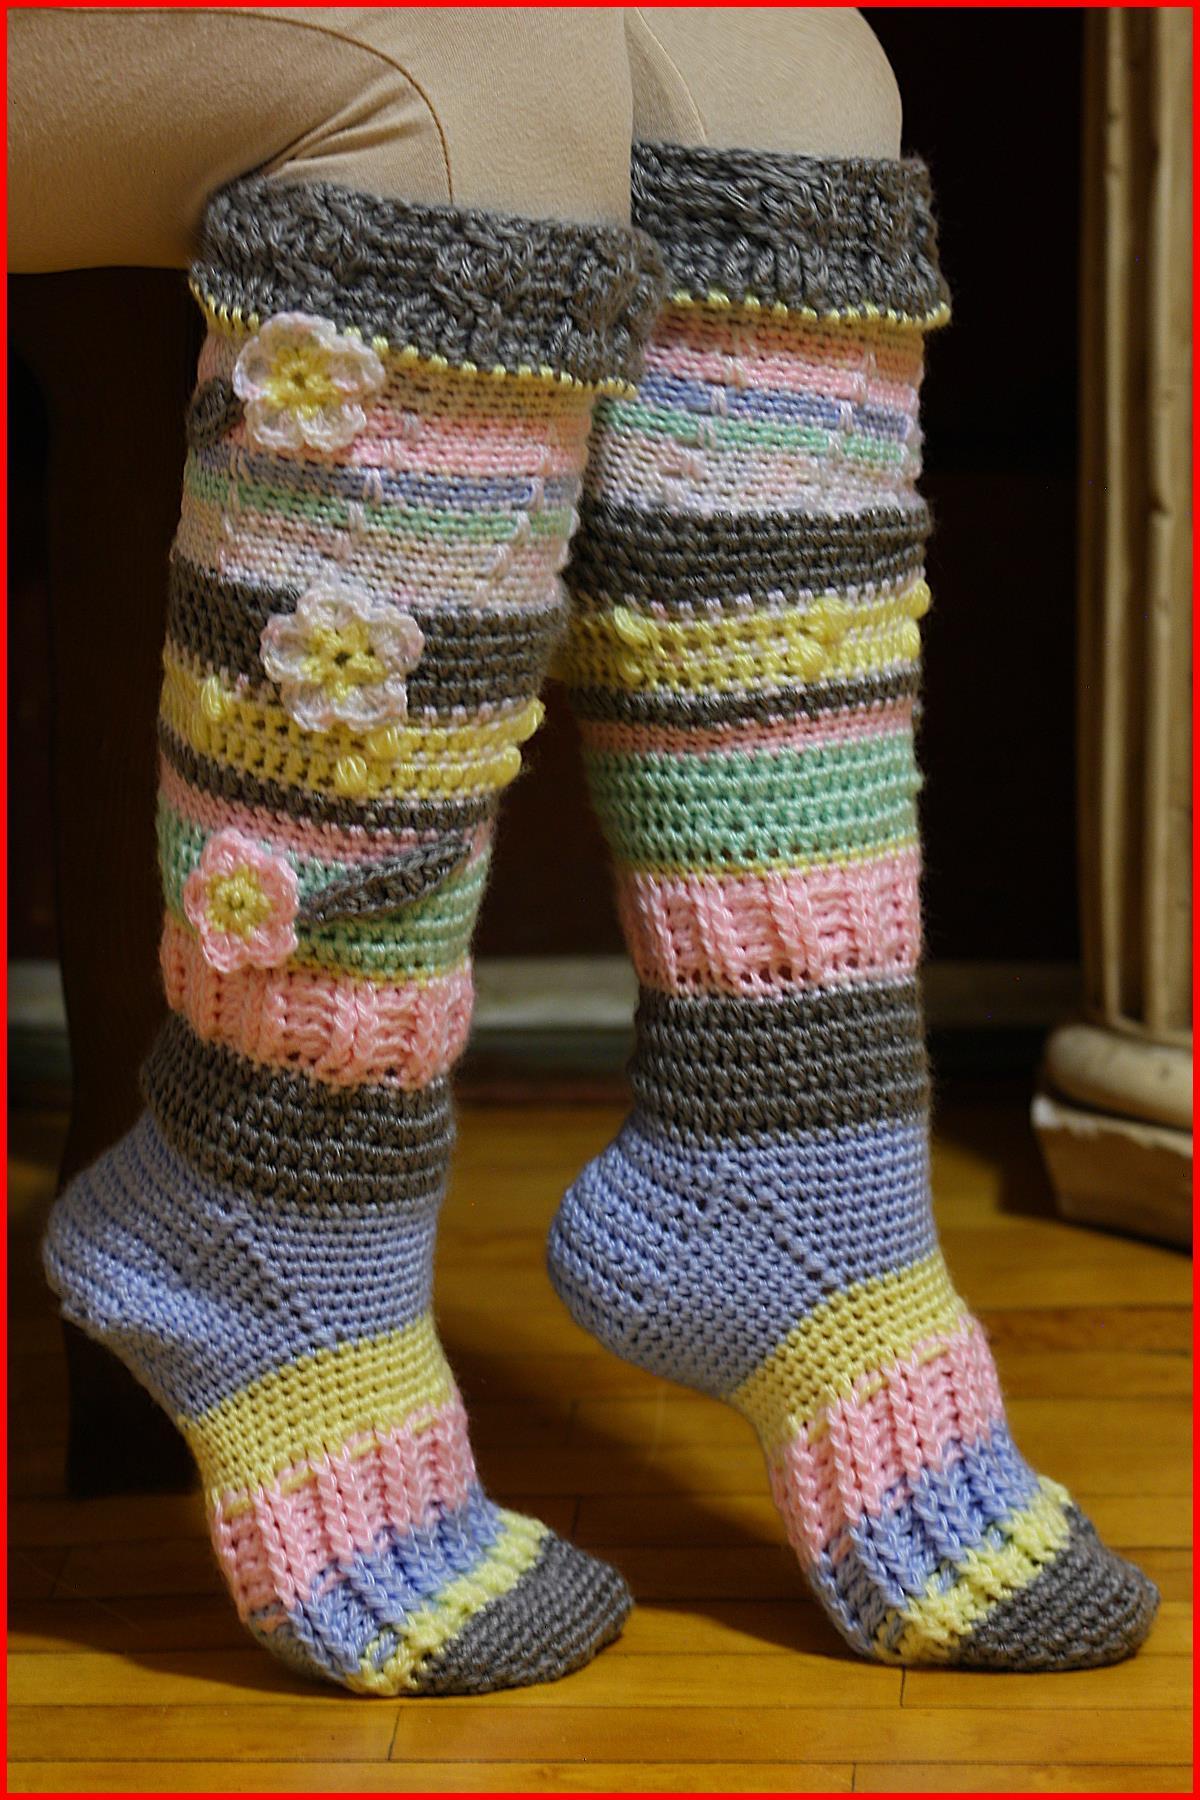 67a4d54eb Crochet Tutorial  Knee-High Socks - YARNutopia by Nadia Fuad ...